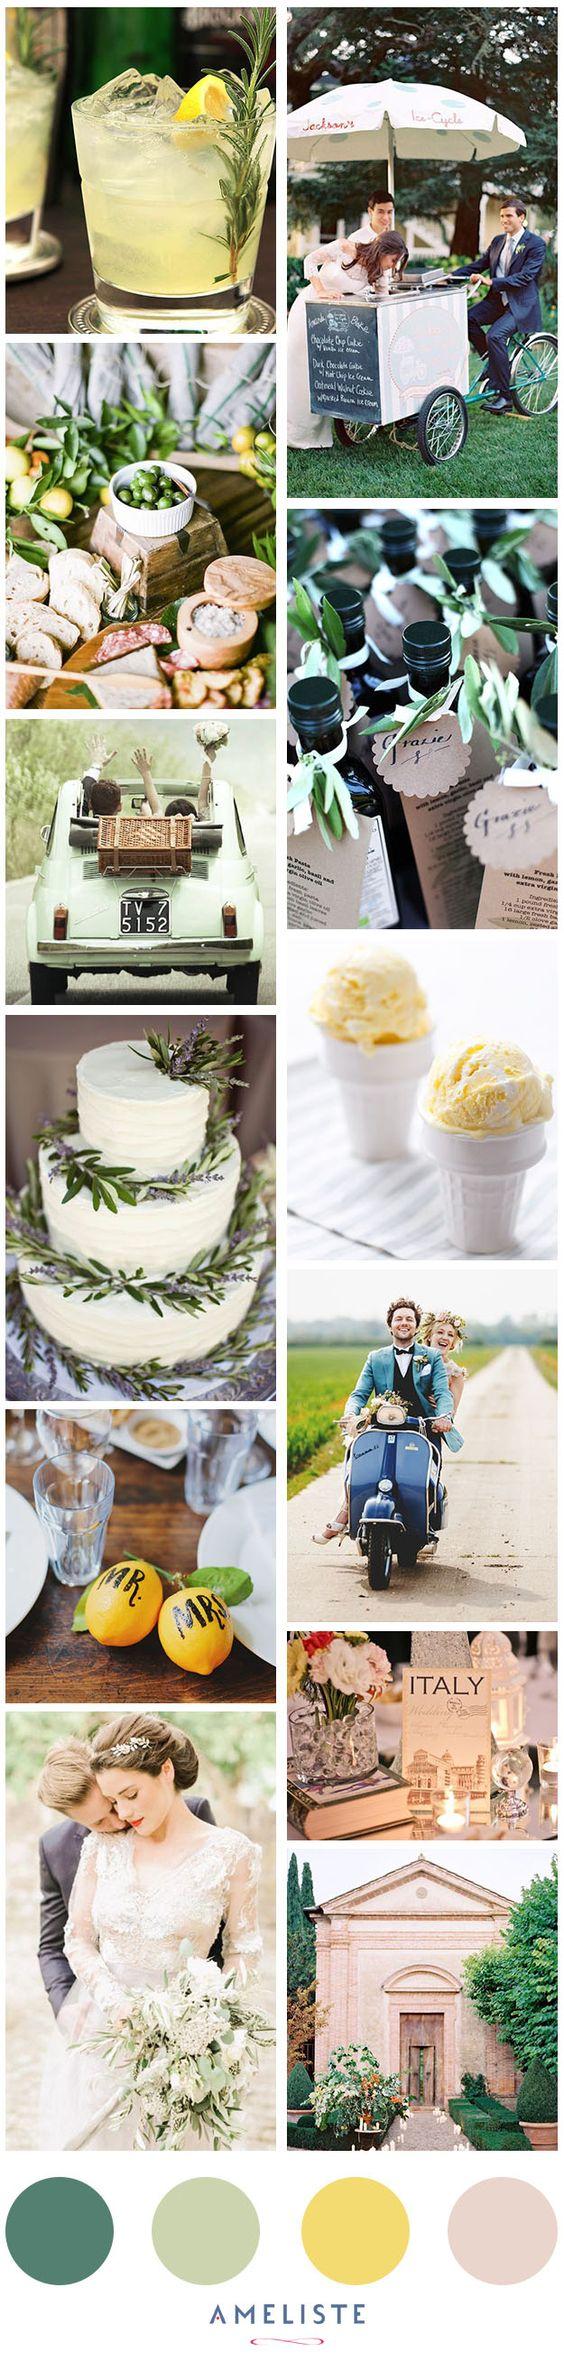 Wedding Ideas // Italian Style Wedding // Wedding in Italy #Italy #wedding